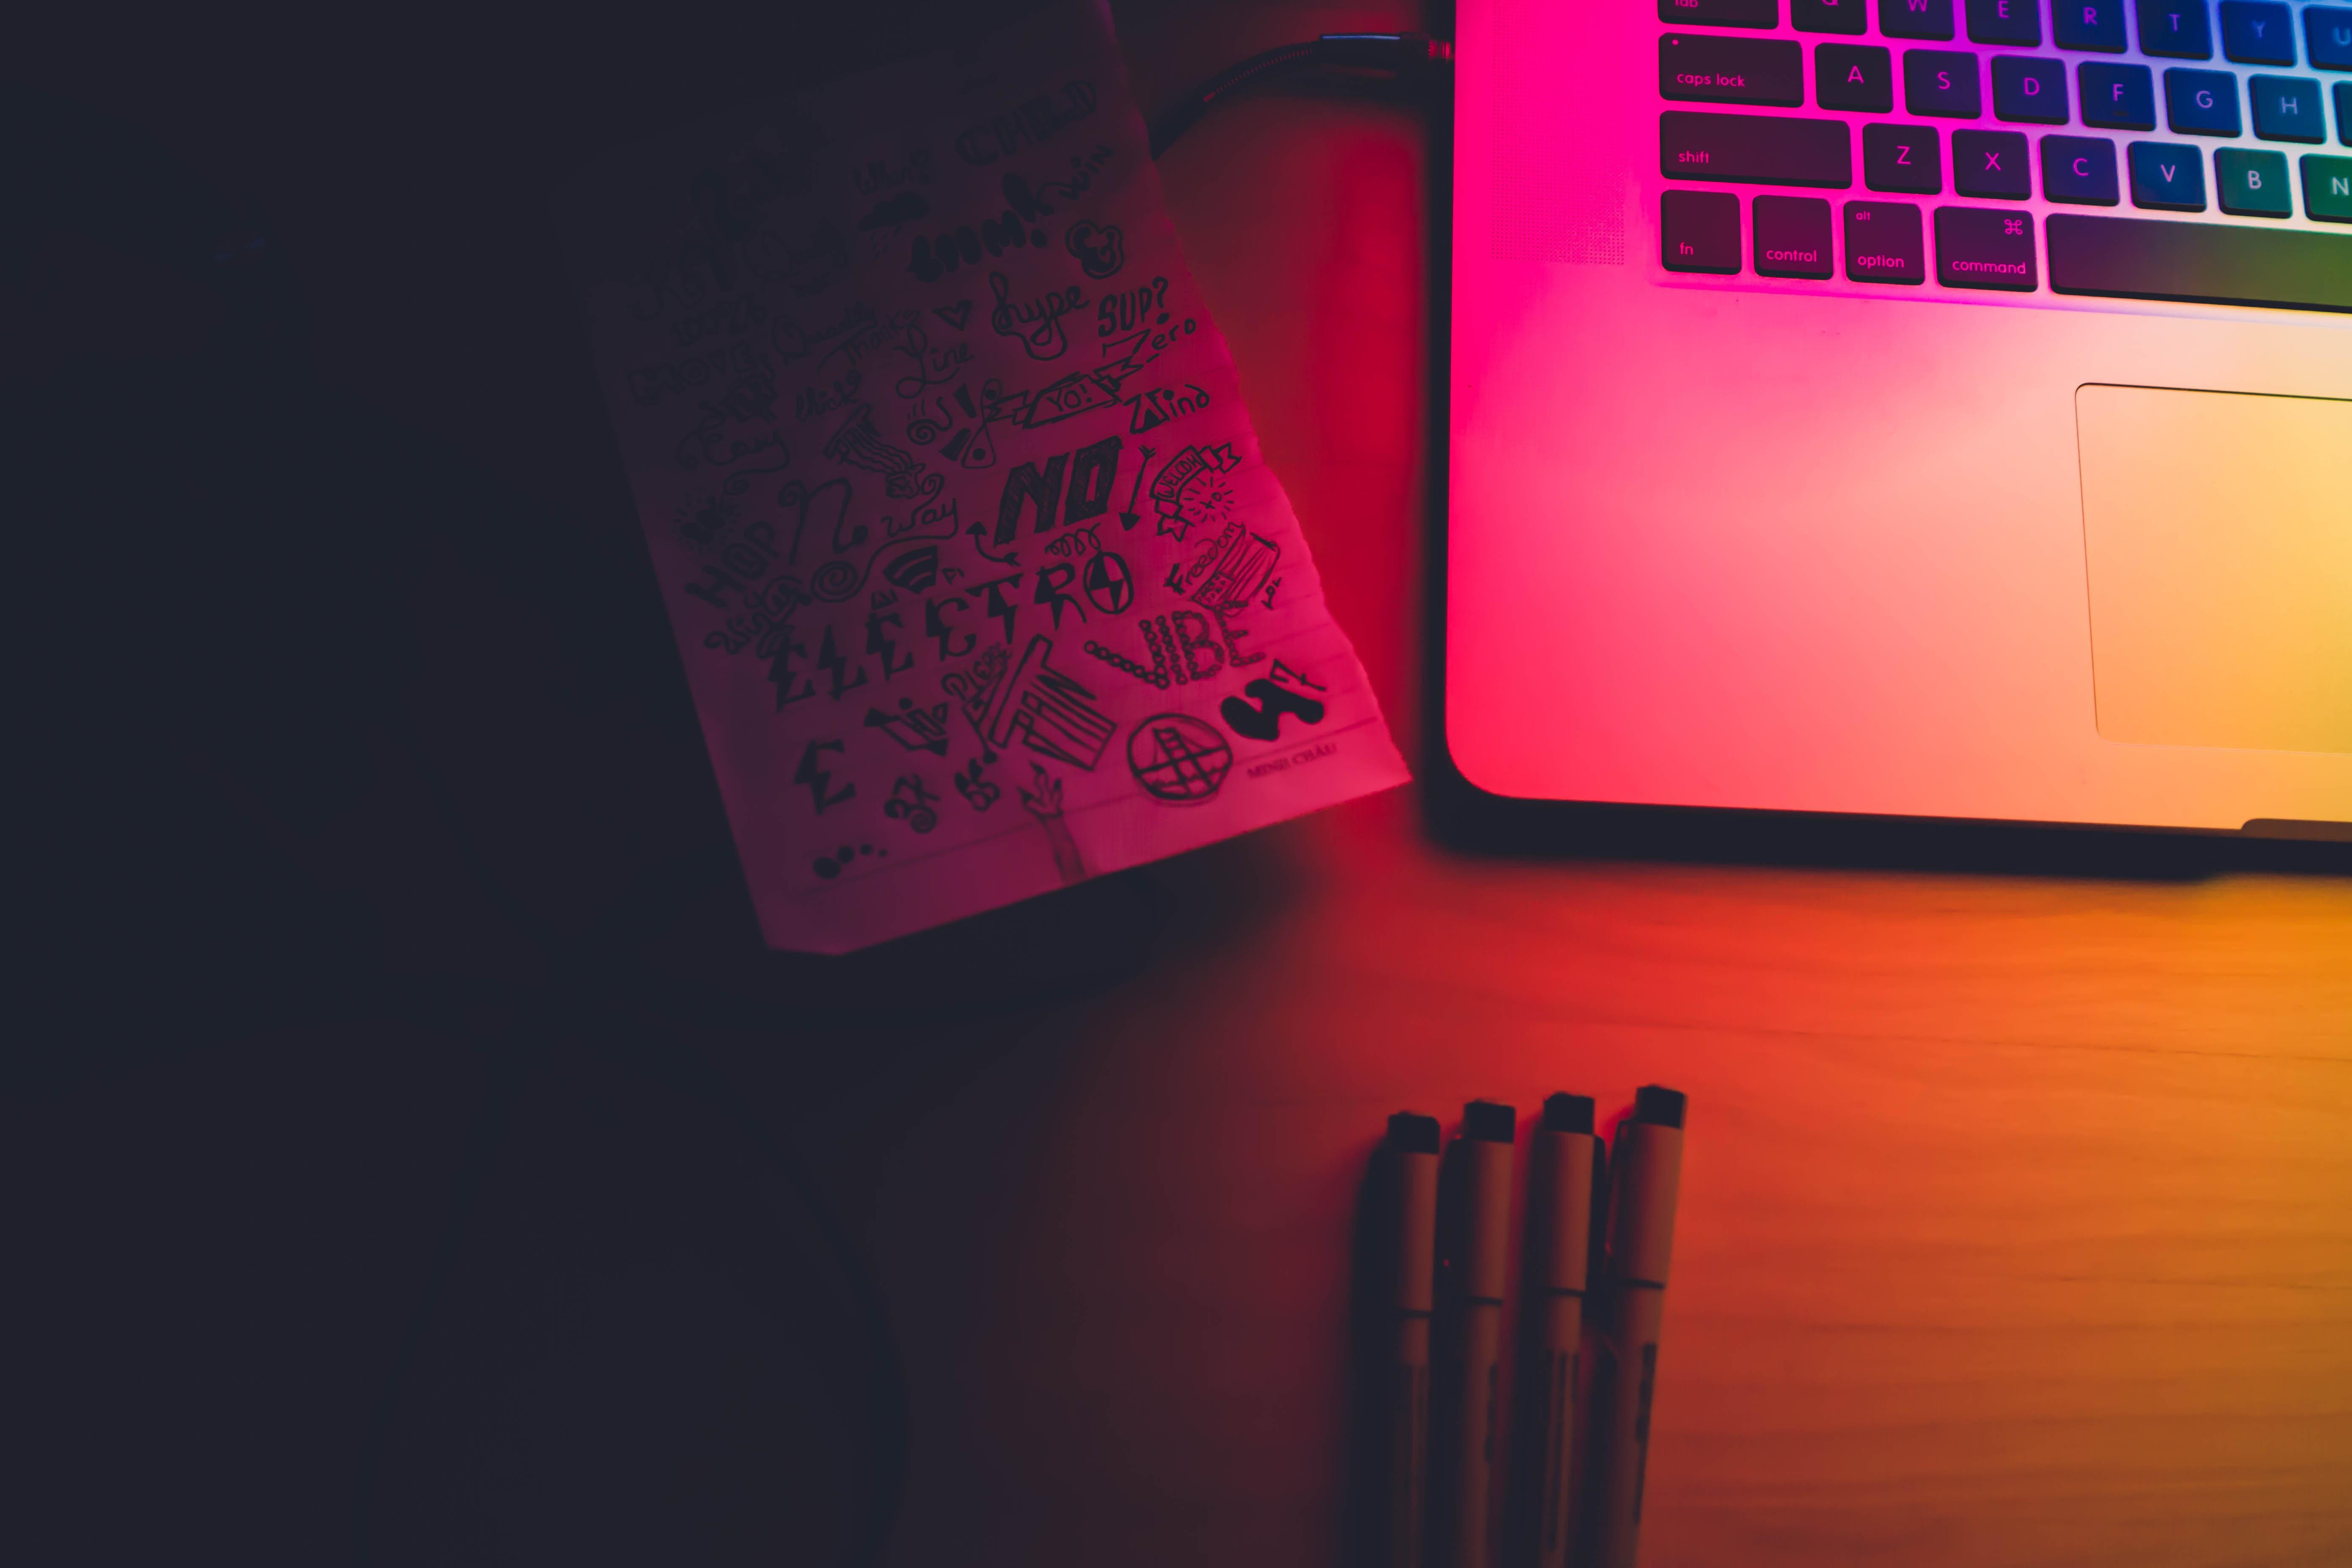 Night sketches near a laptop keyboard under rainbow lighting.